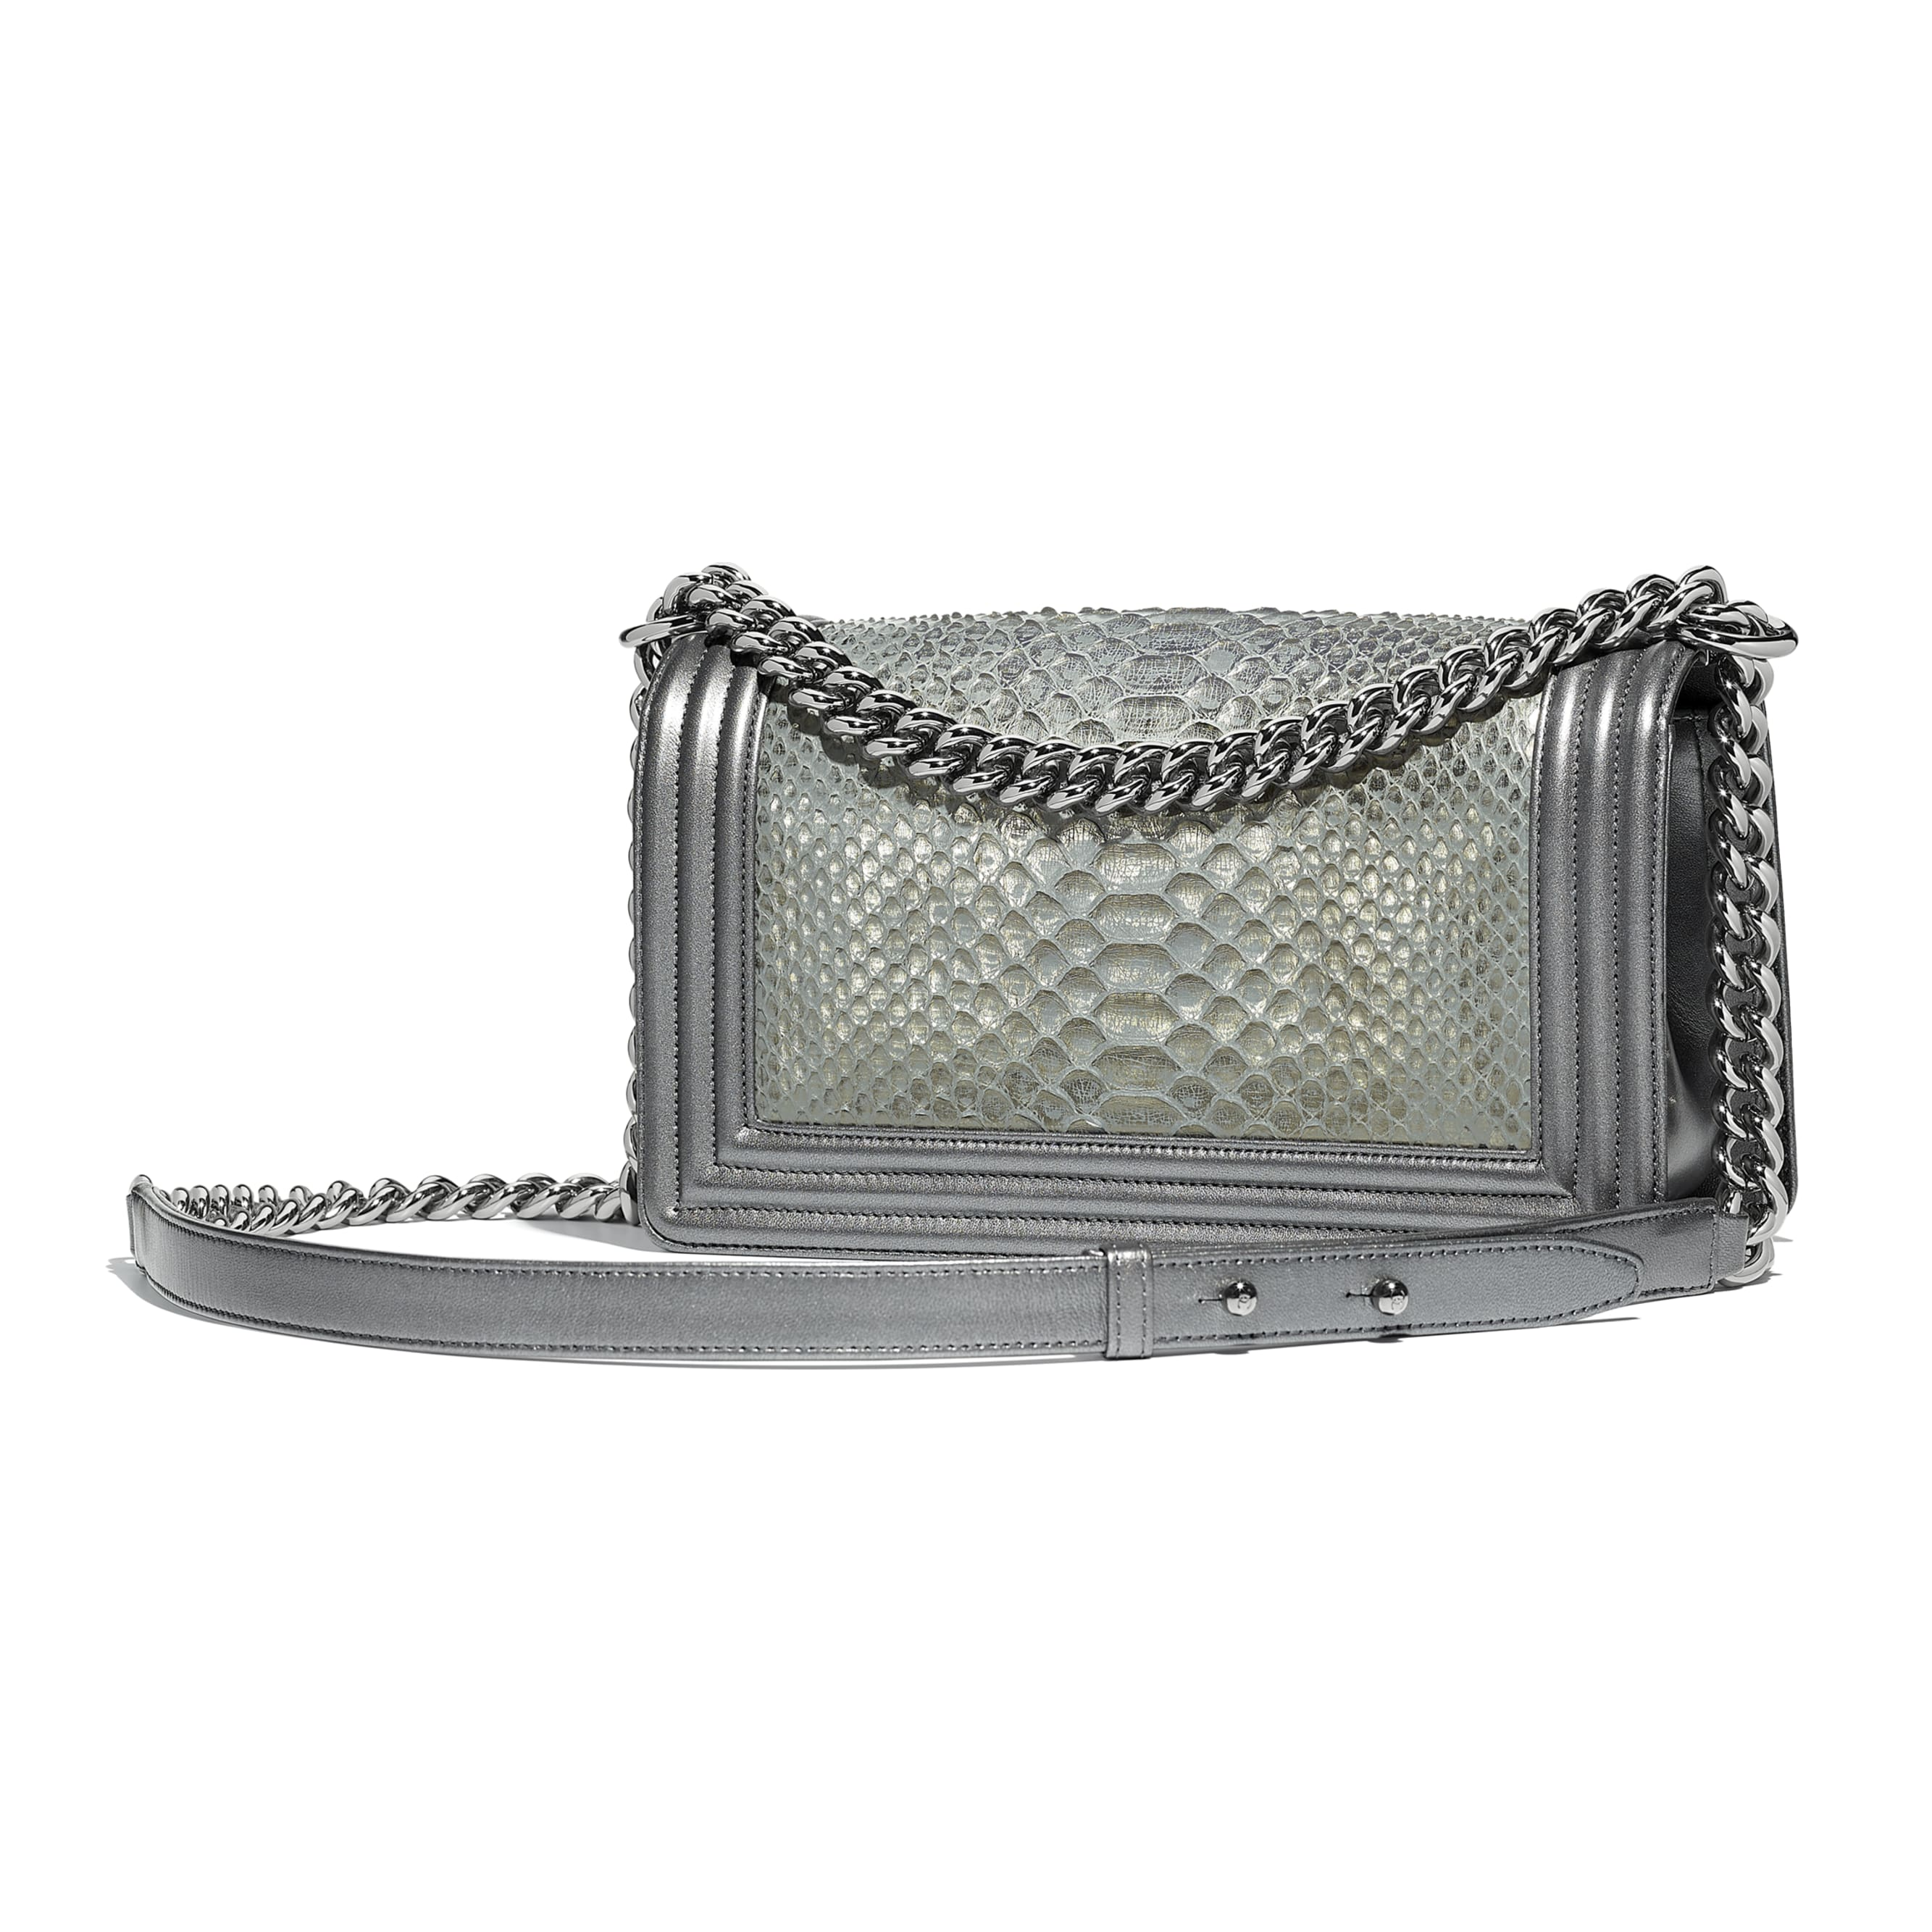 BOY CHANEL Handbag - Silver - Python, Metallic Lambskin & Ruthenium-Finish Metal - Alternative view - see standard sized version